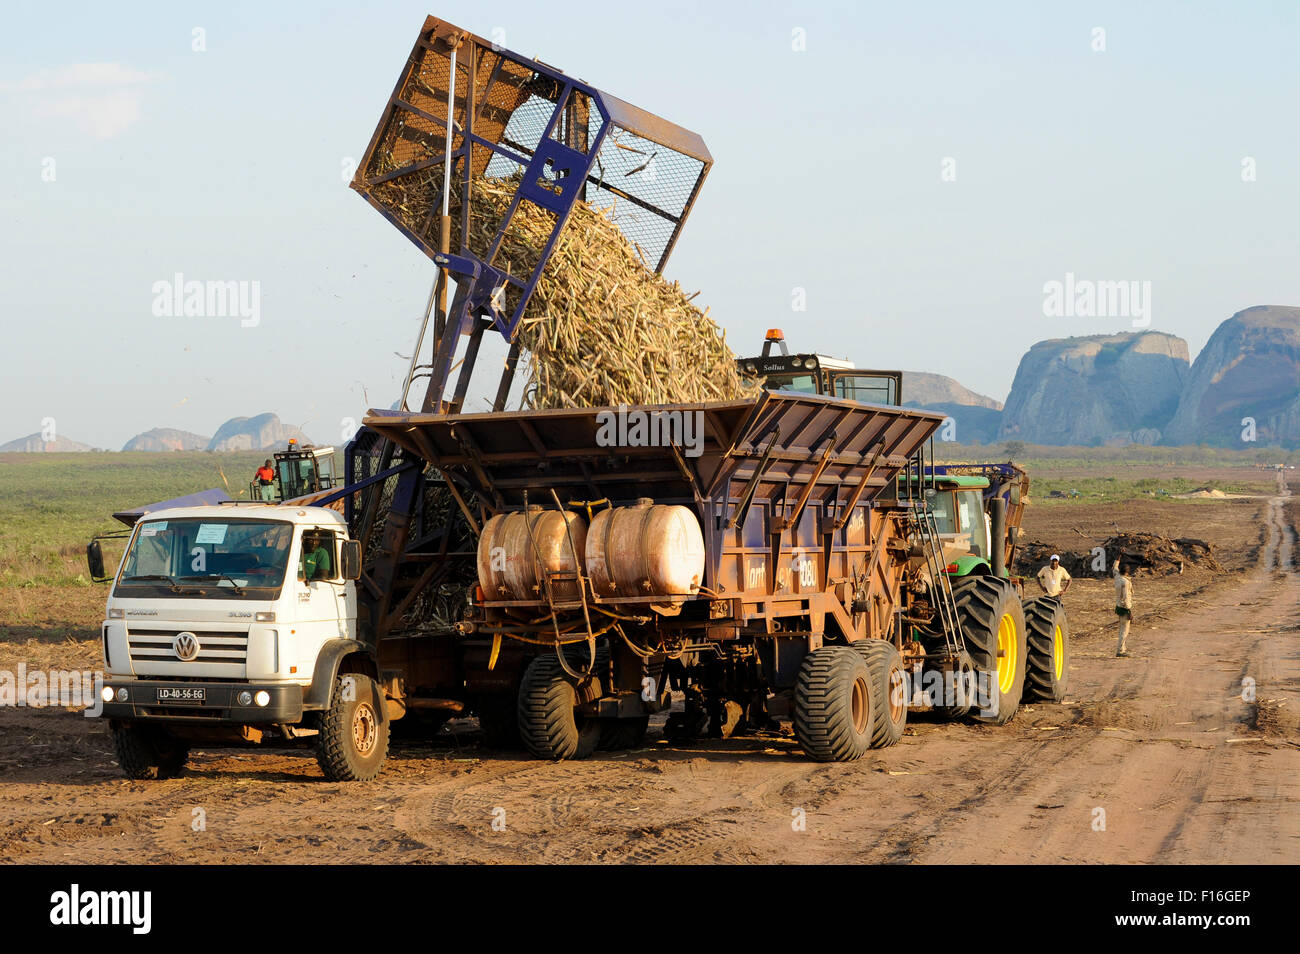 ANGOLA Malange , PAC Pòlo Agroindustrial de Capanda, Biocom Project, joint venture of Brazil company Odebrecht - Stock Image